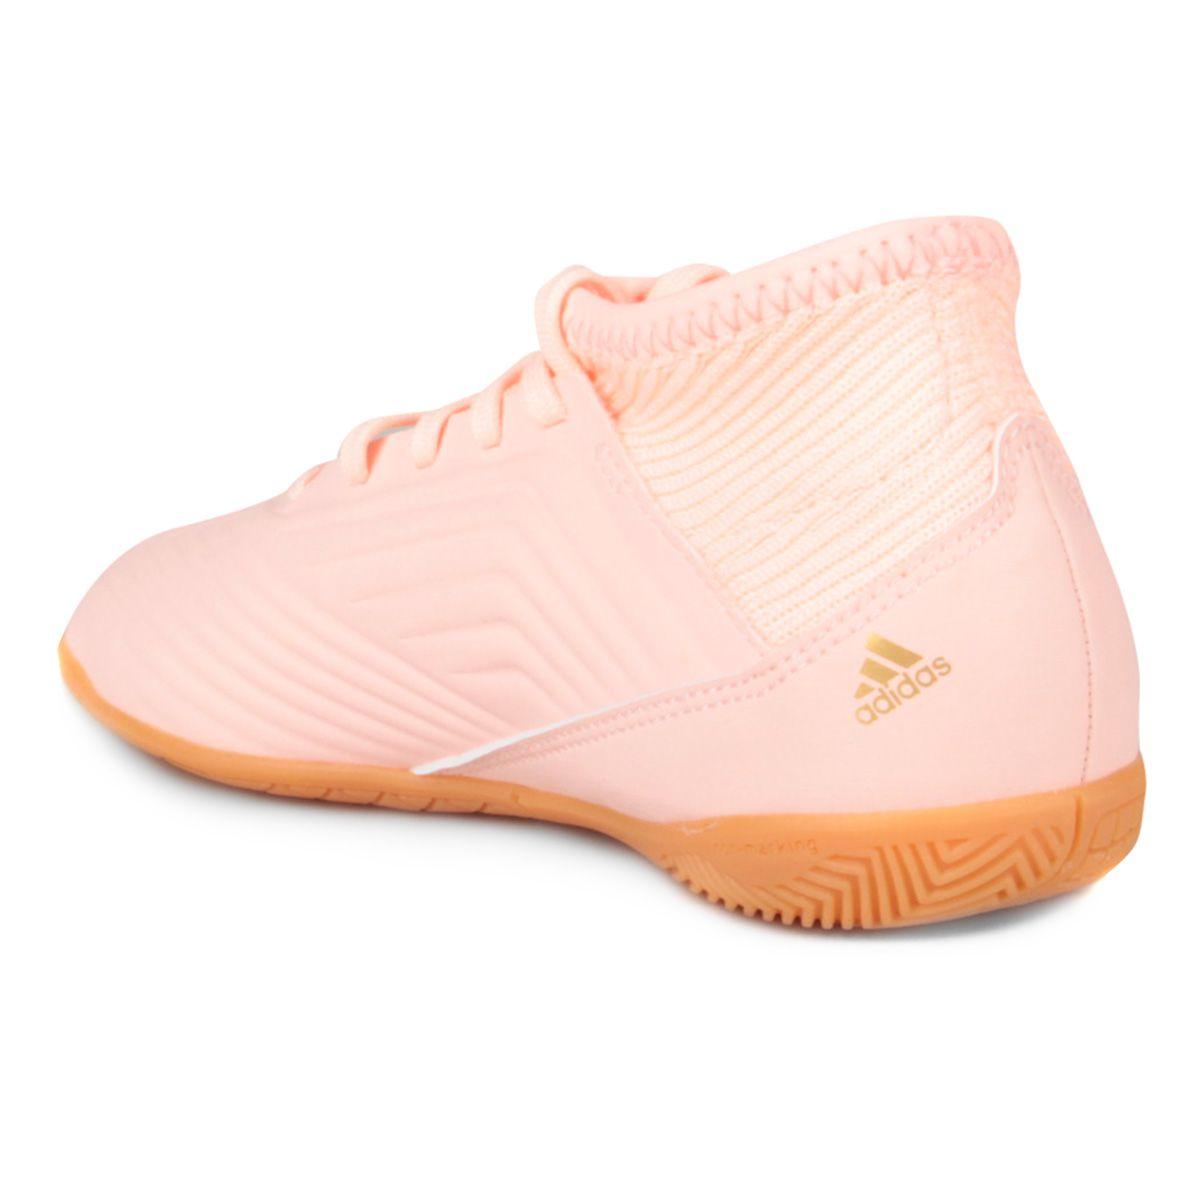 Chuteira Futsal Infantil Adidas Predator 18 3 IN - Compre Agora ... ecb9508783aa1